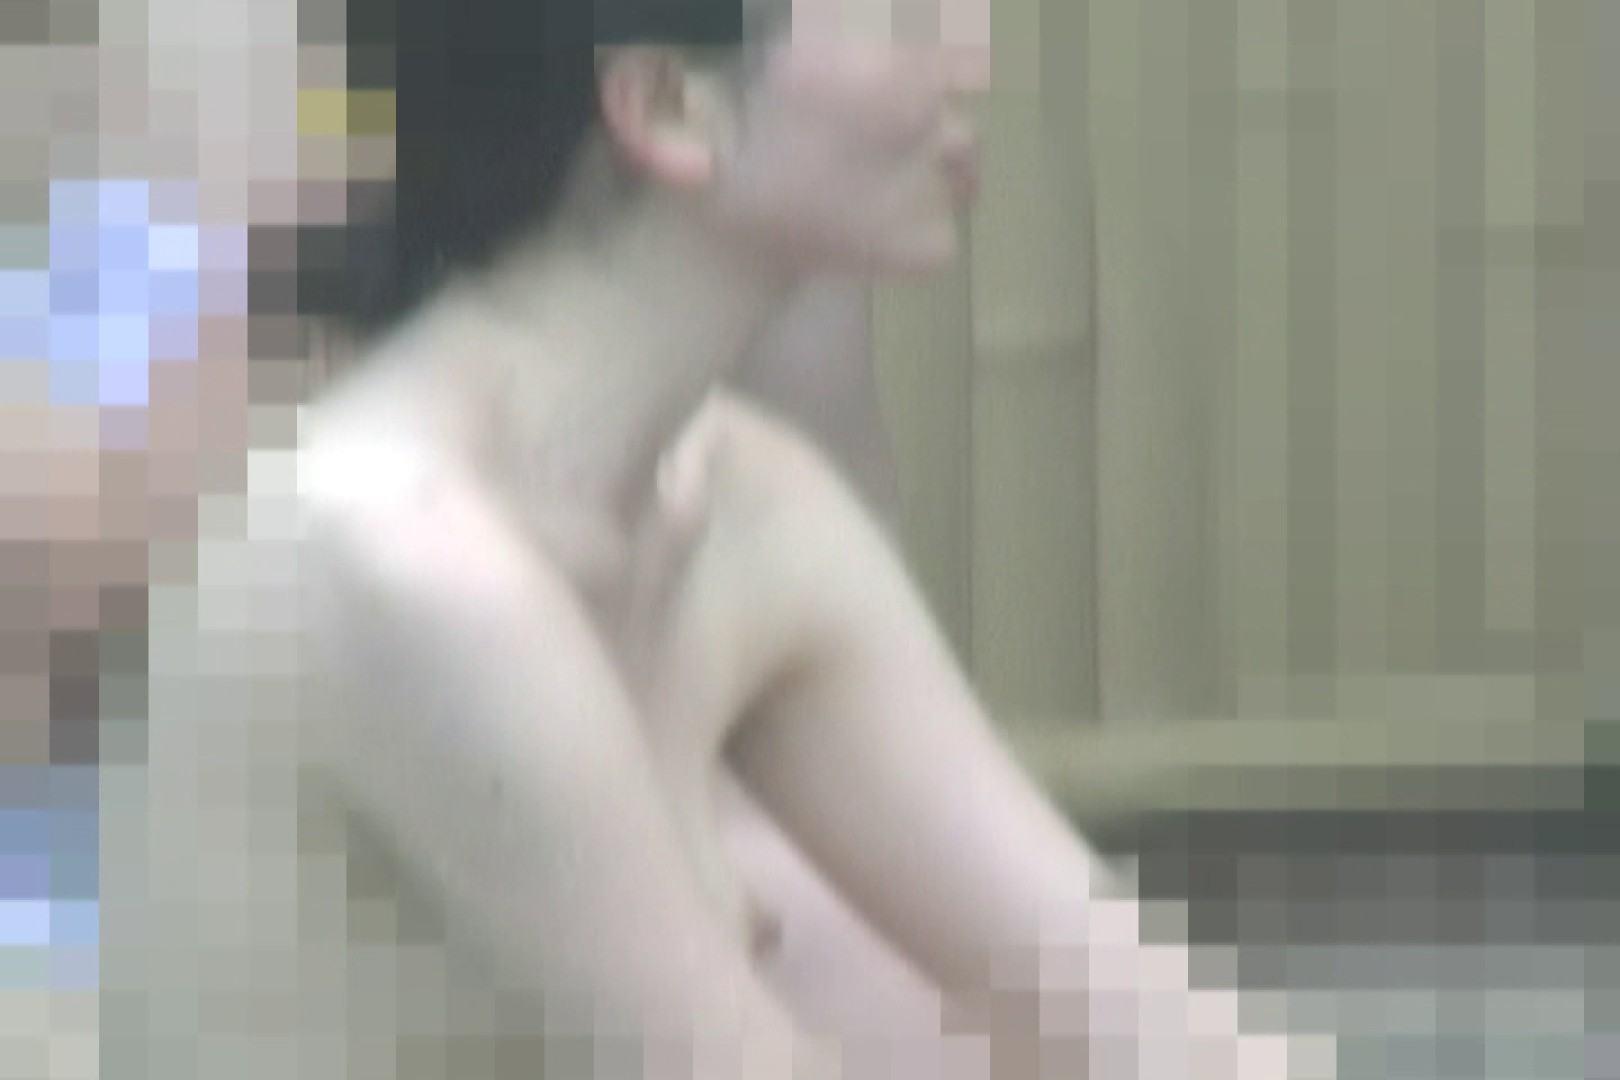 Aquaな露天風呂Vol.835 盗撮 | HなOL  73pic 47